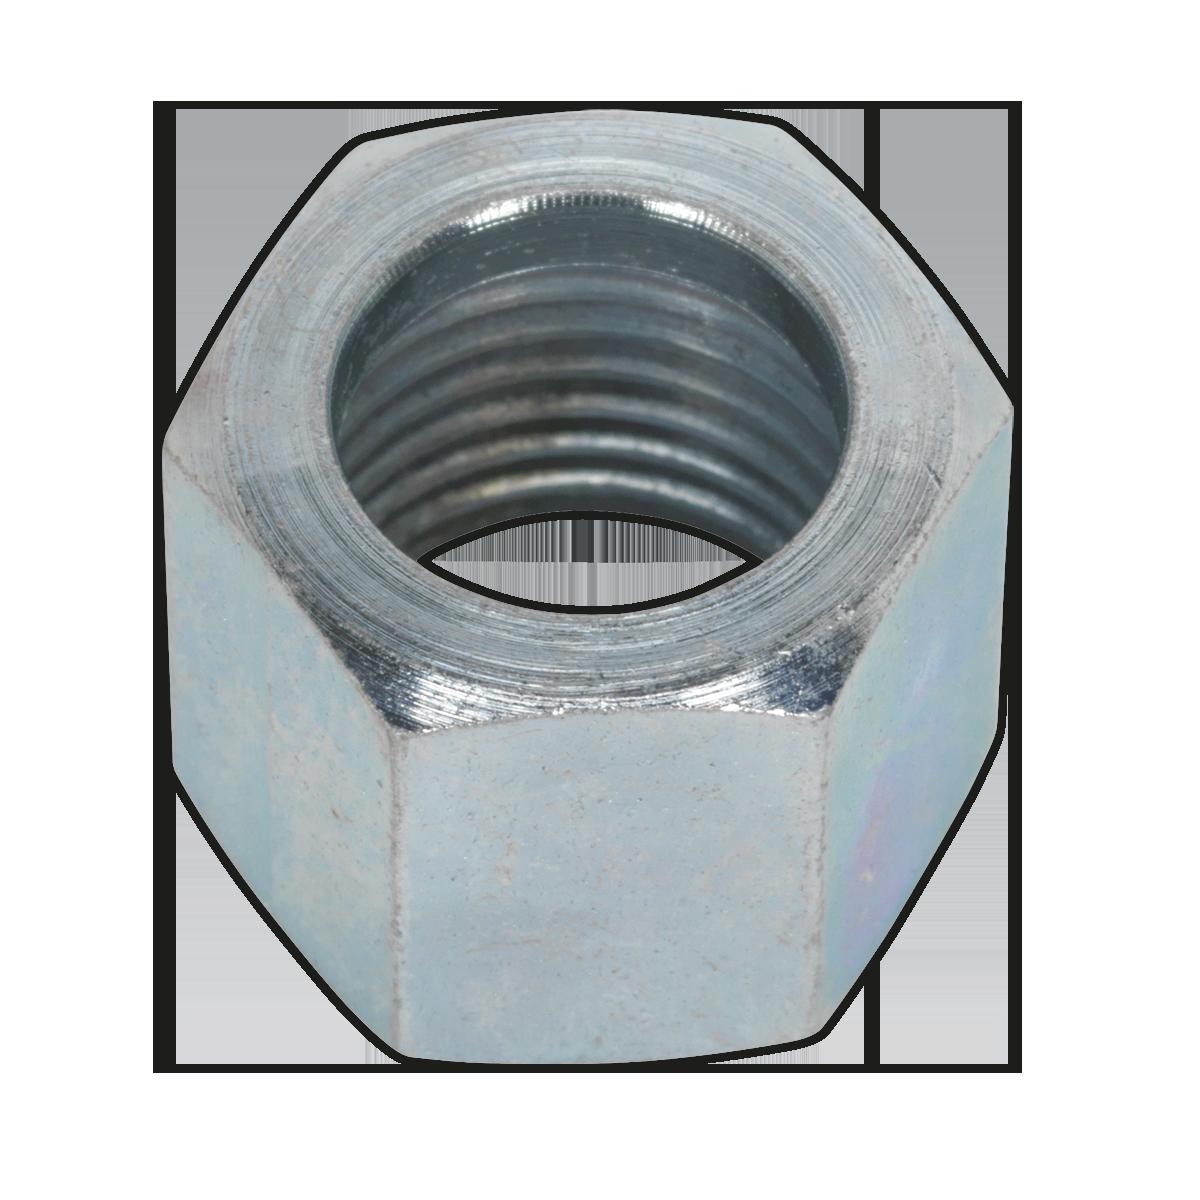 Sealey AC52 union nut for AC46 1//4 inbsp 3pk